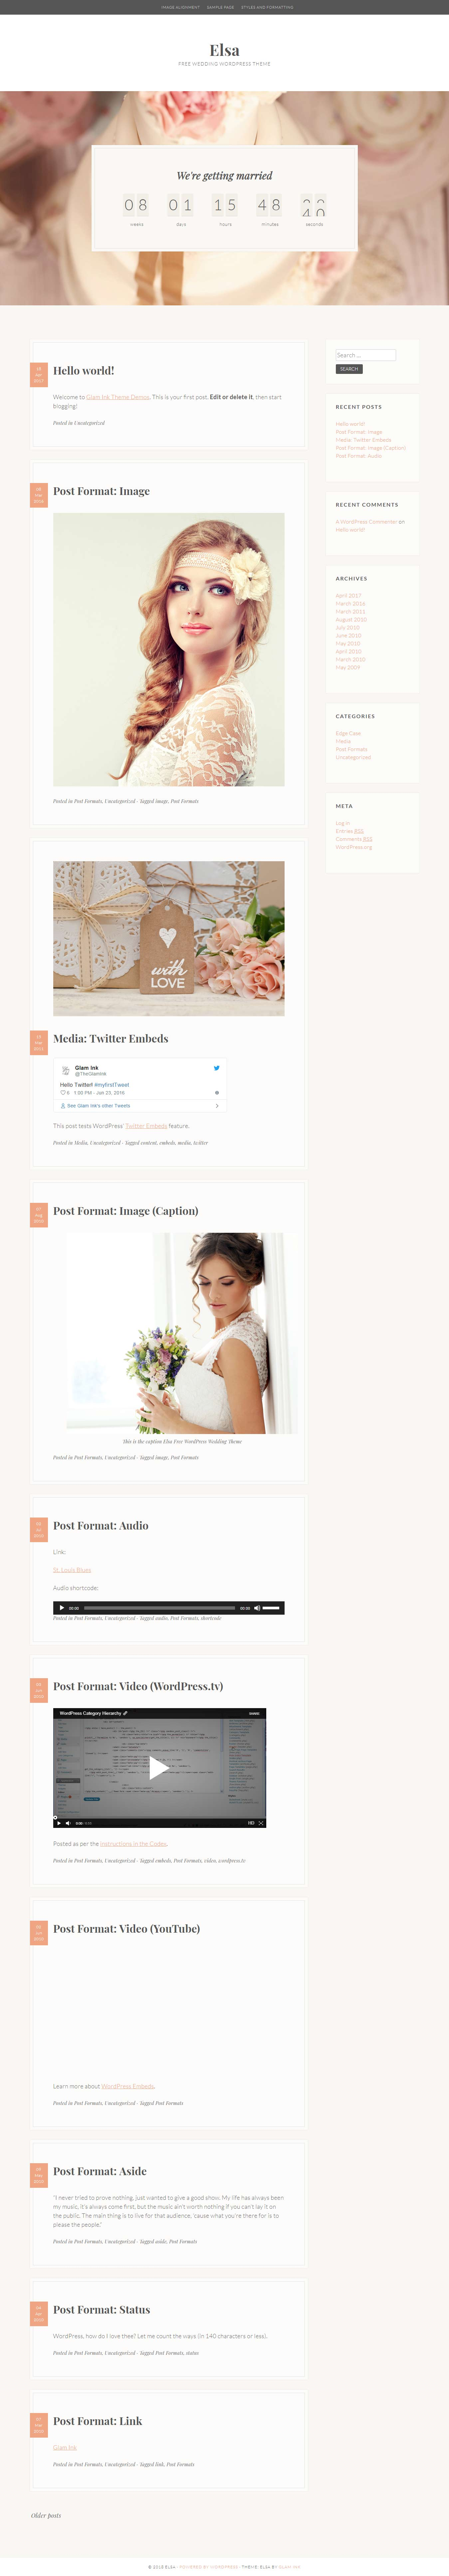 Elsa - Best Free Event WordPress Theme